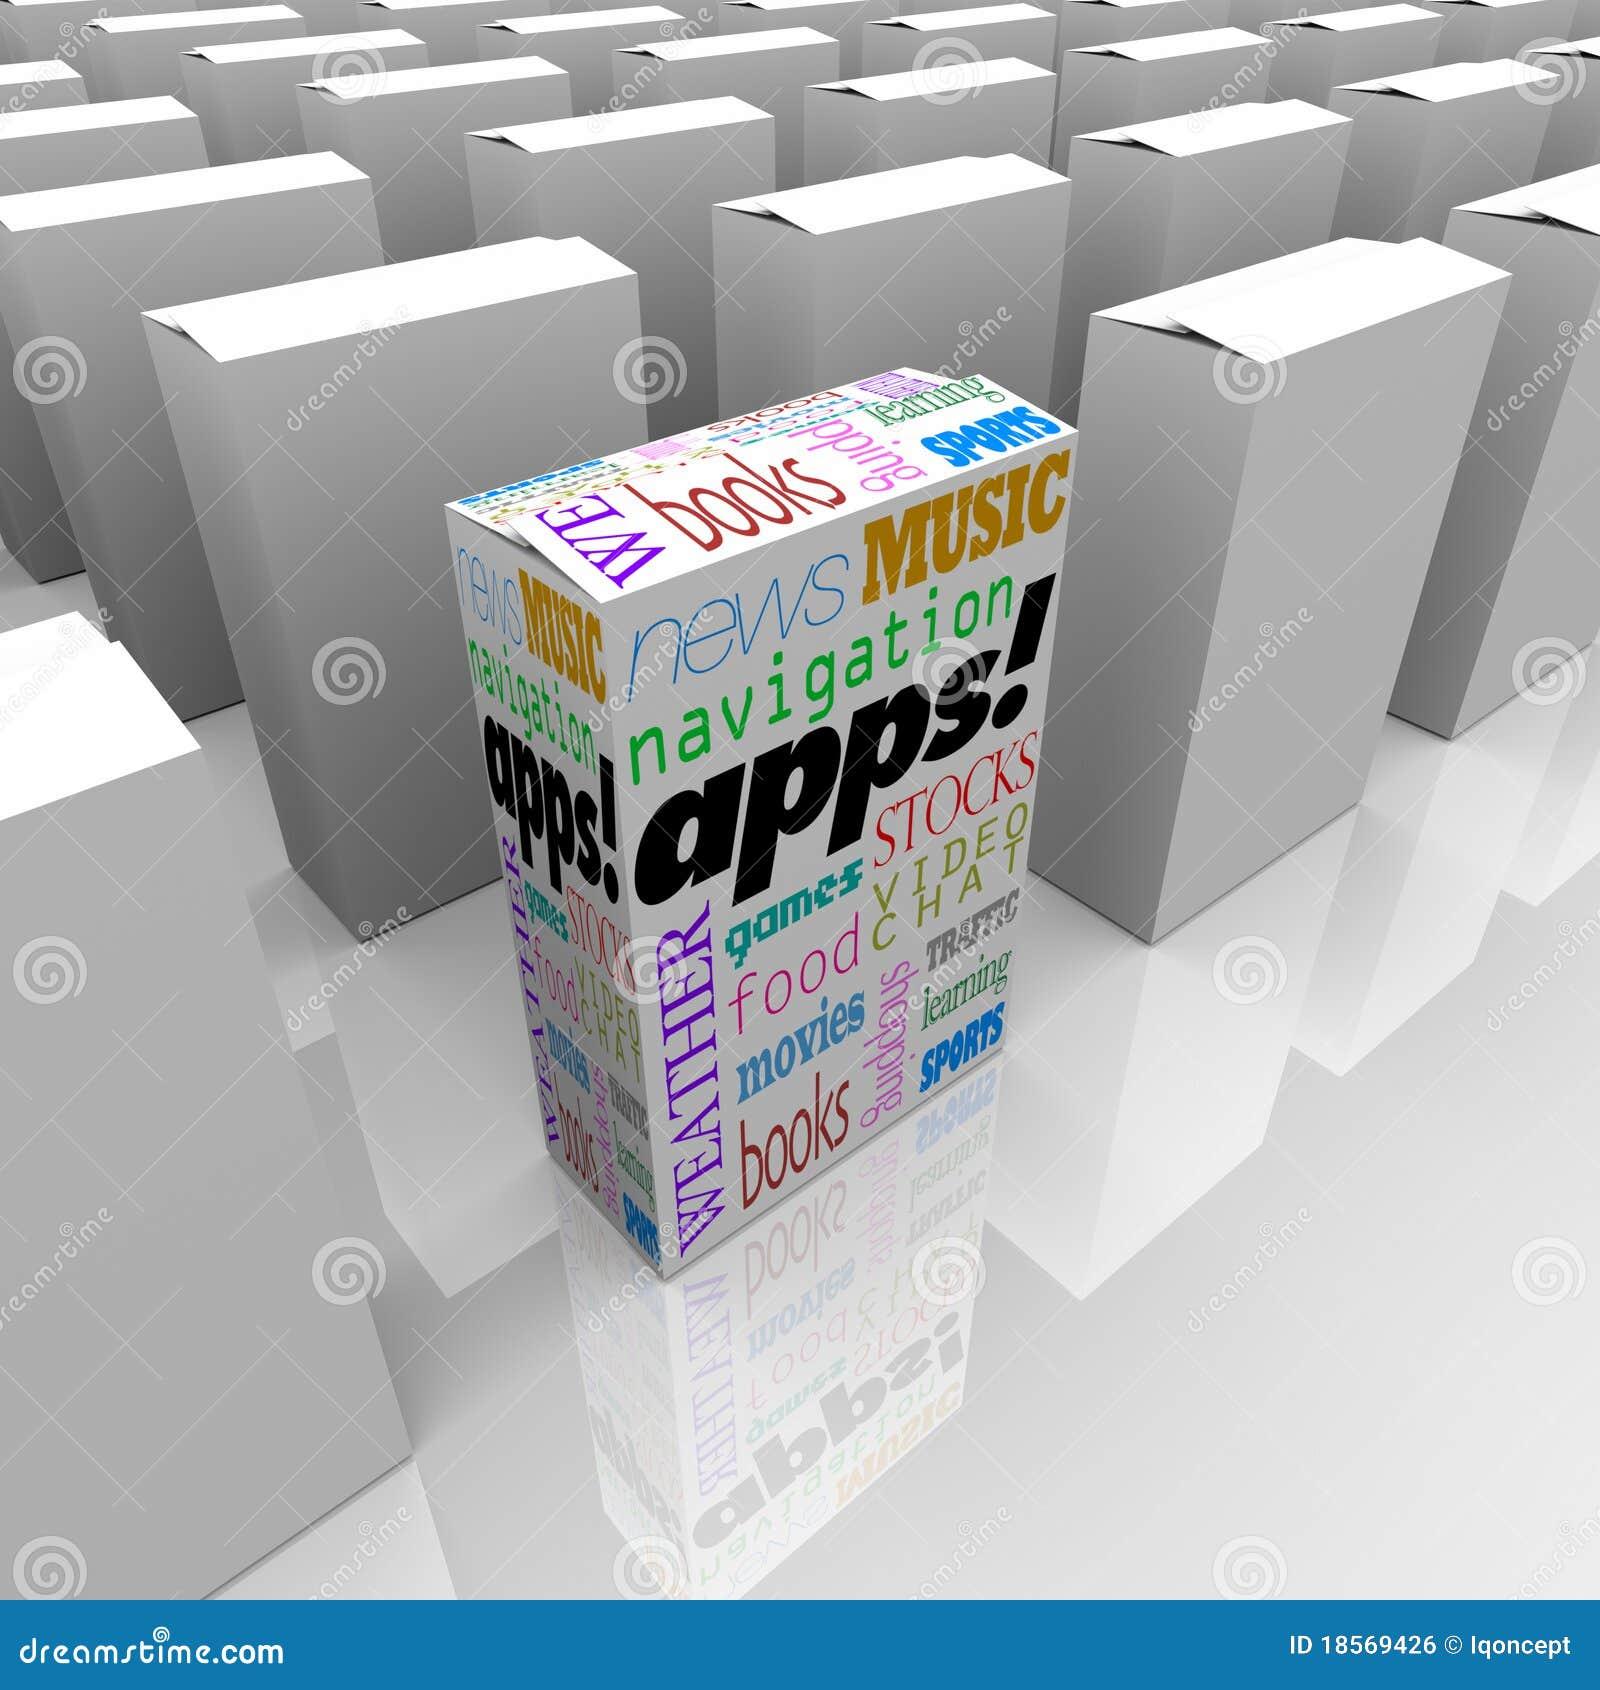 Applikationapps boxes många programvarulagret